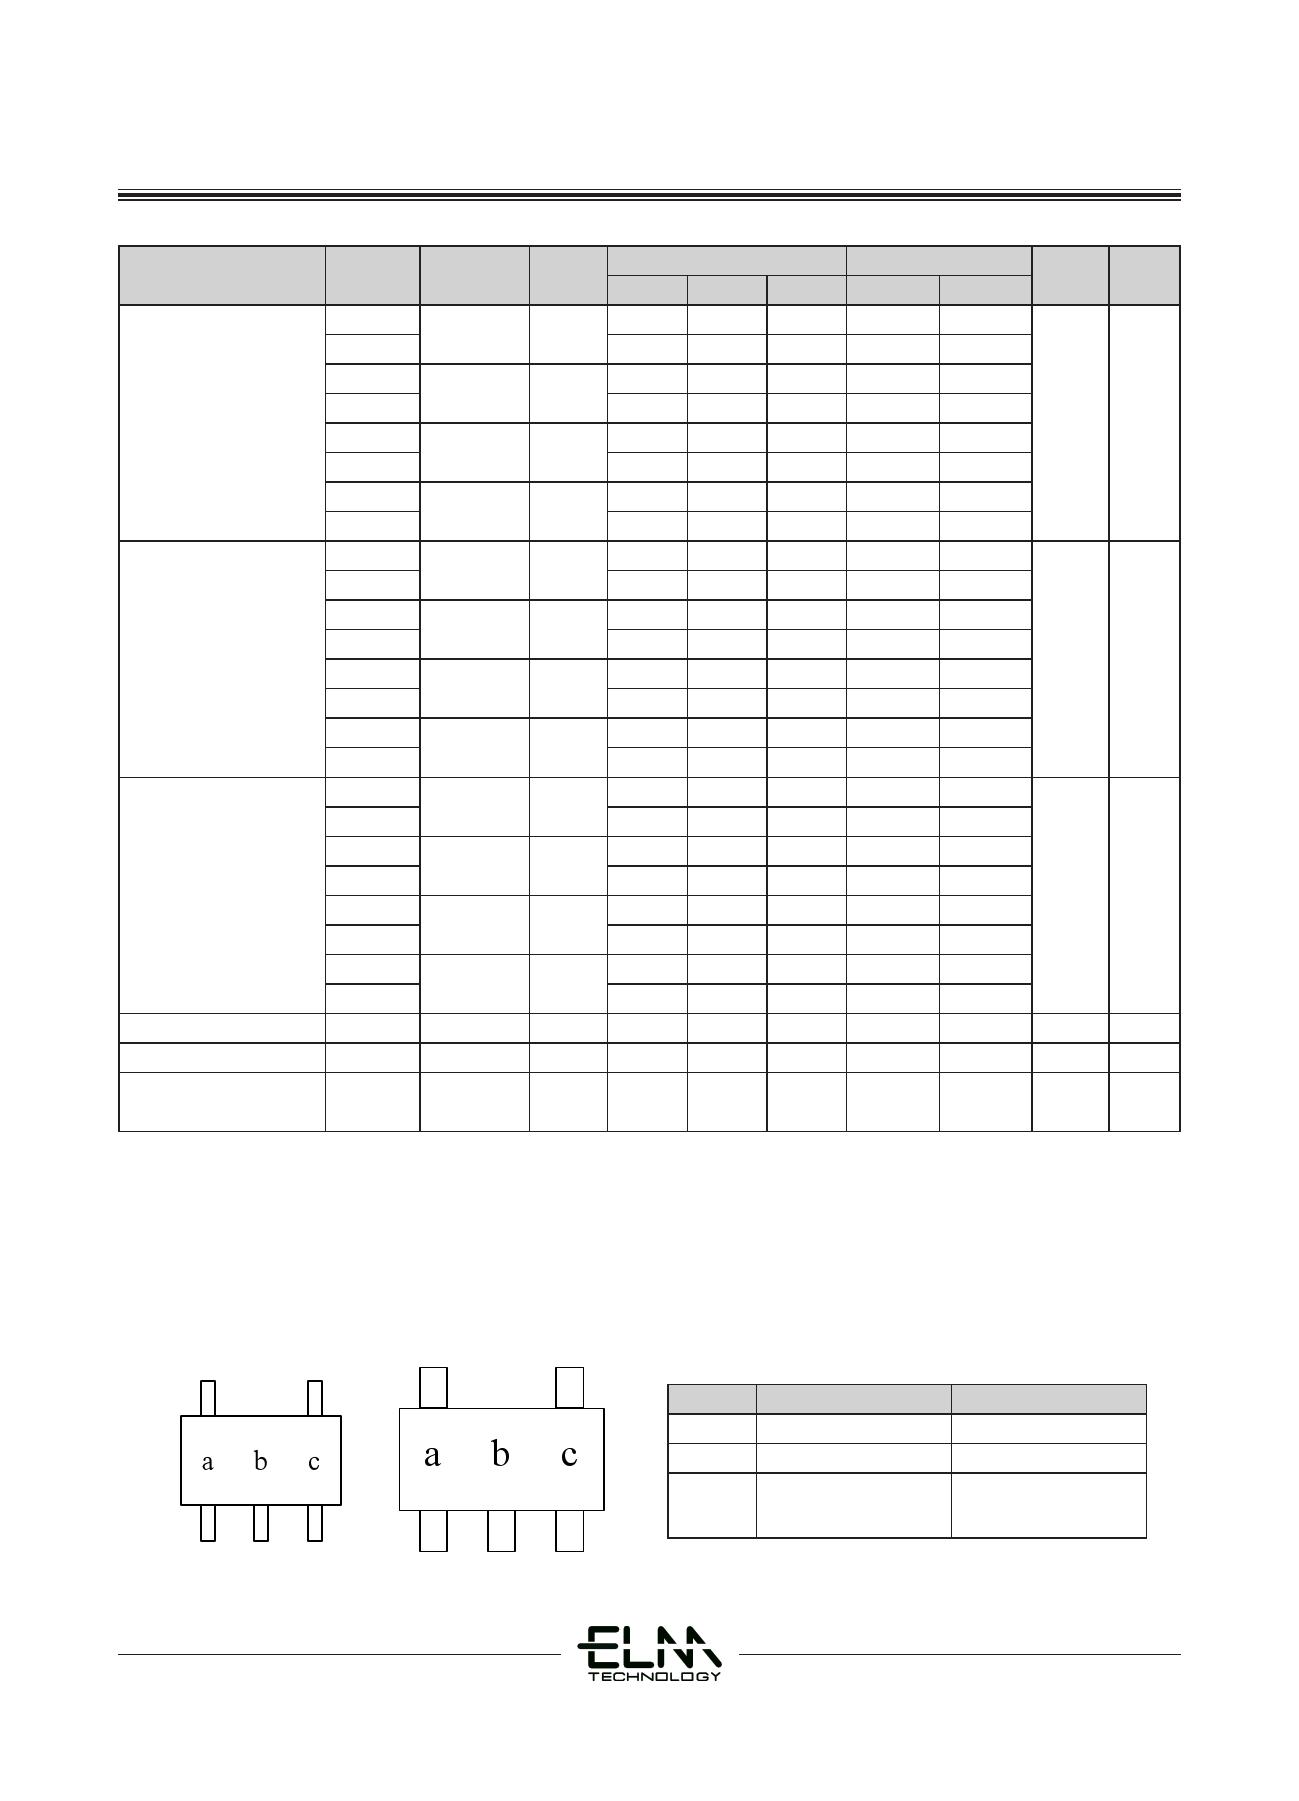 ELM7SH126MA pdf, ピン配列